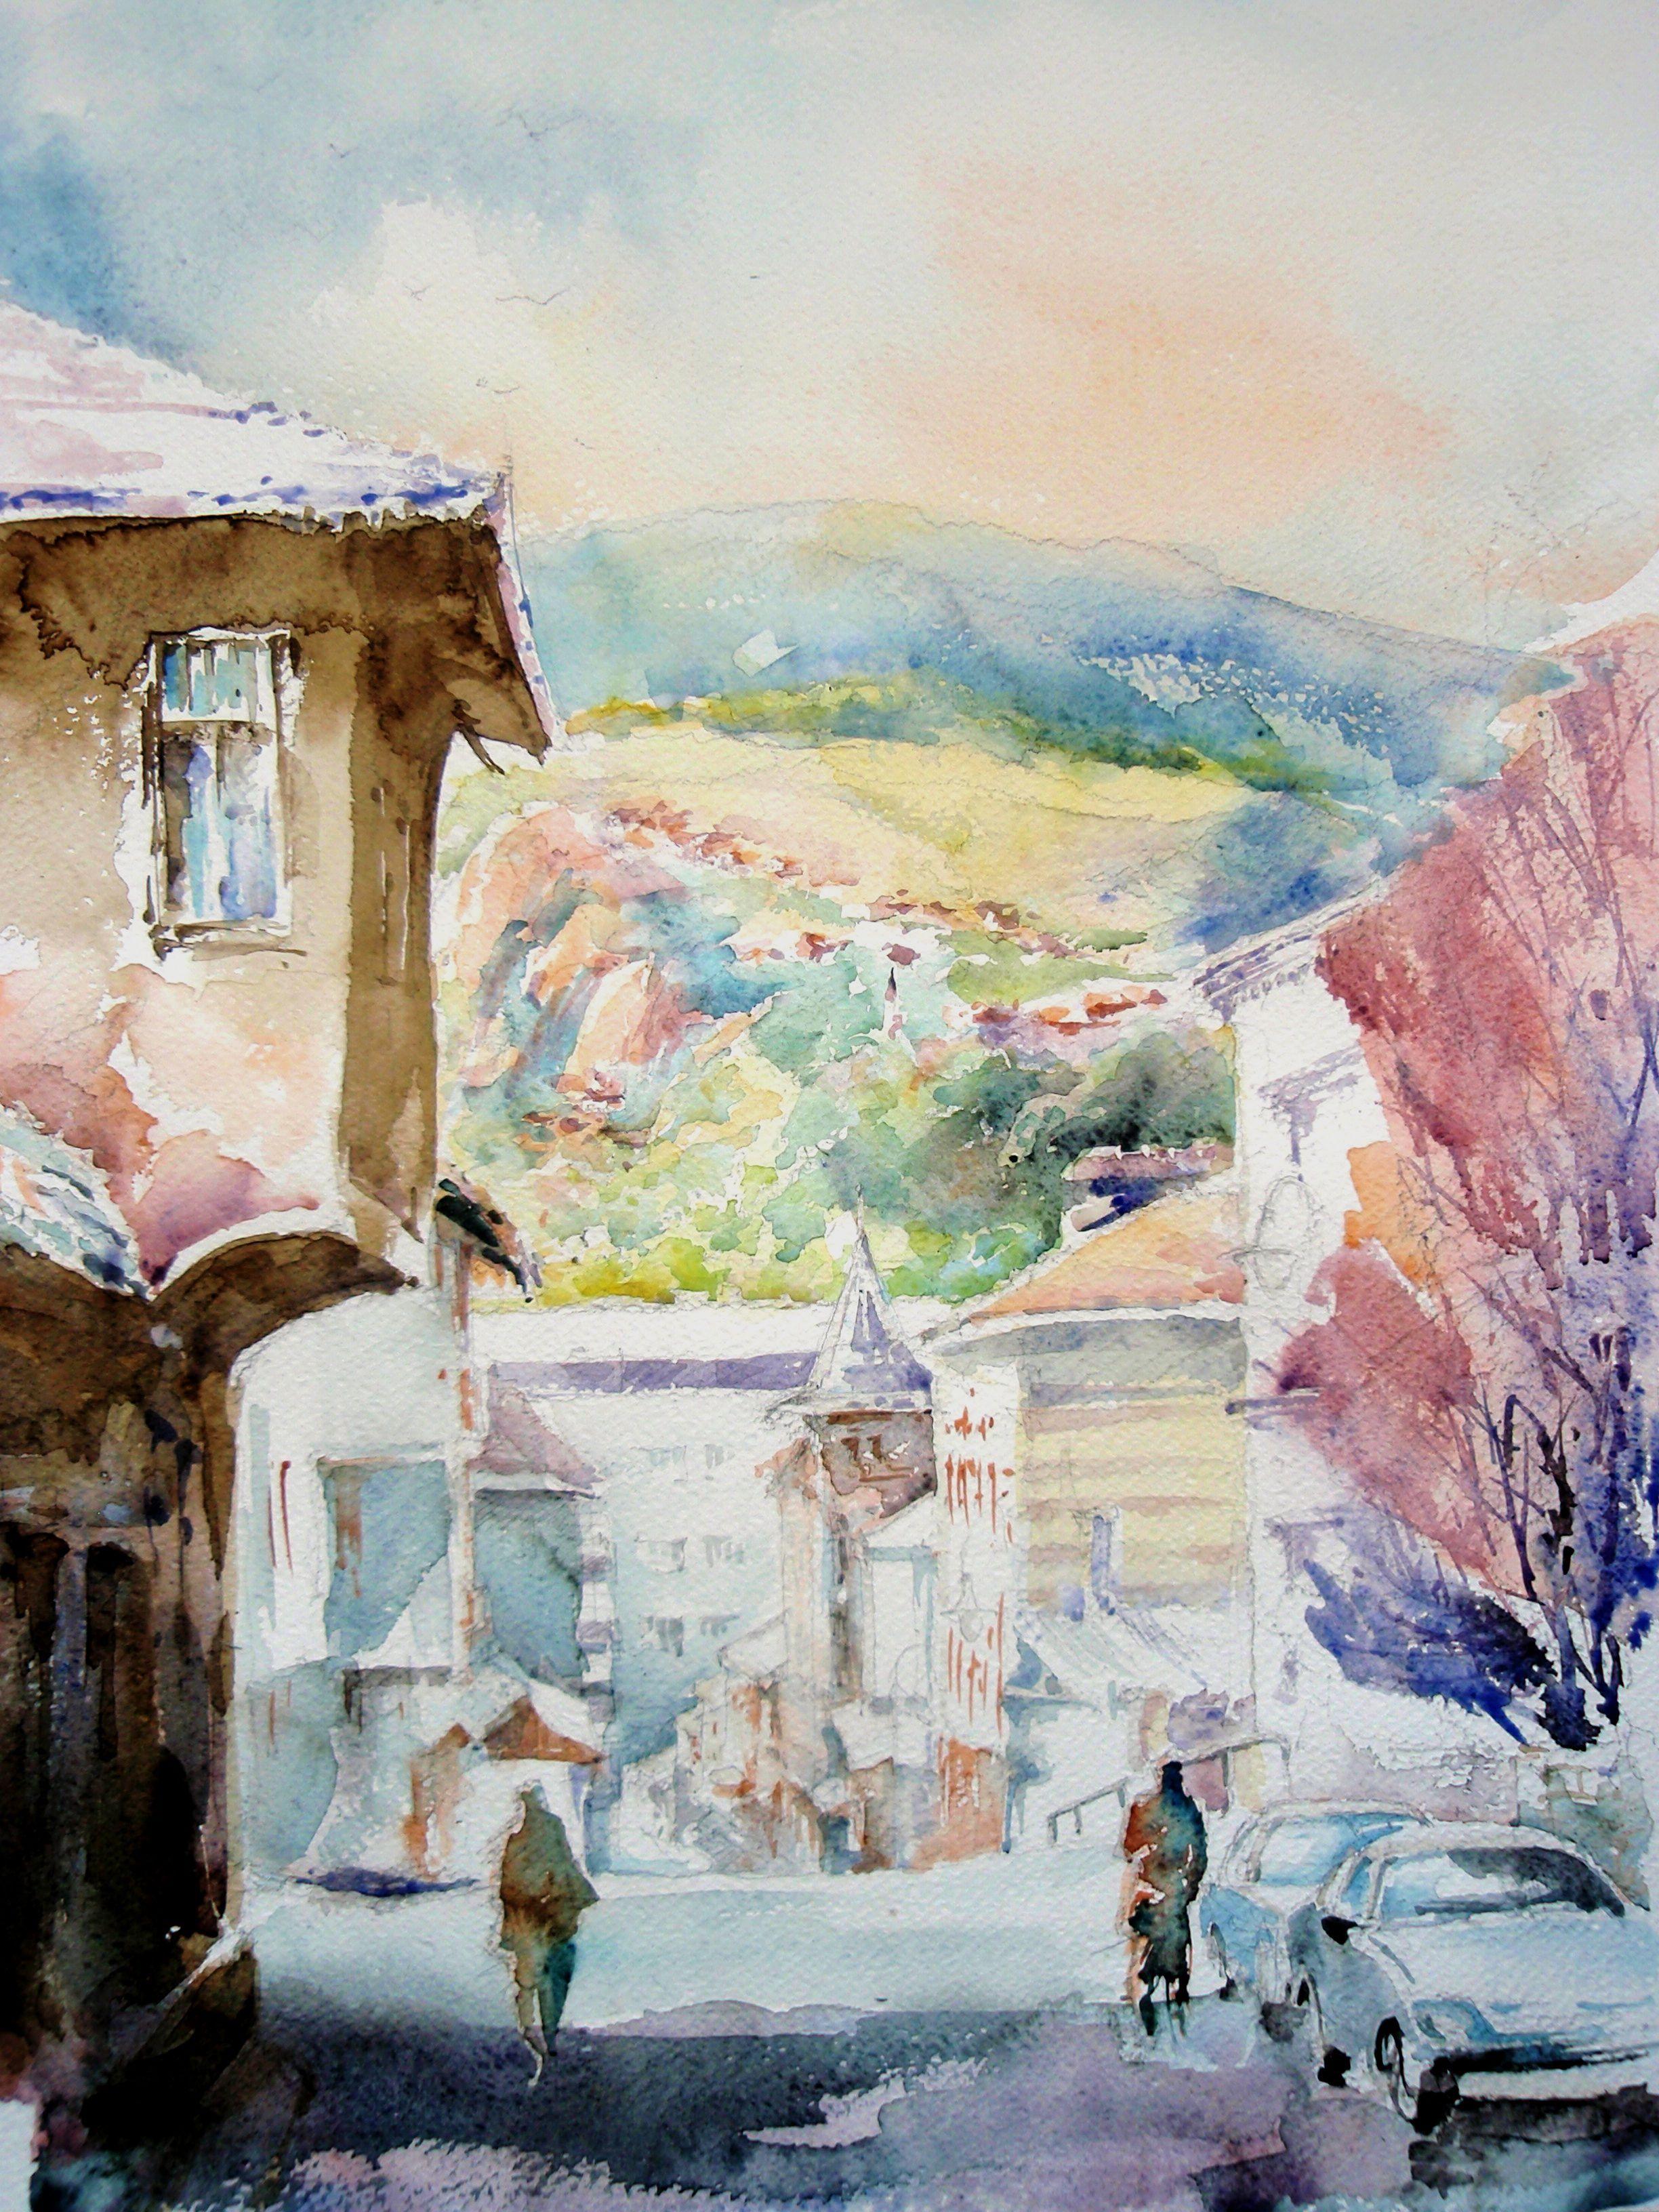 Color art fojnica - Sarajevo Bosnia Herzegovina Old Town Logavina